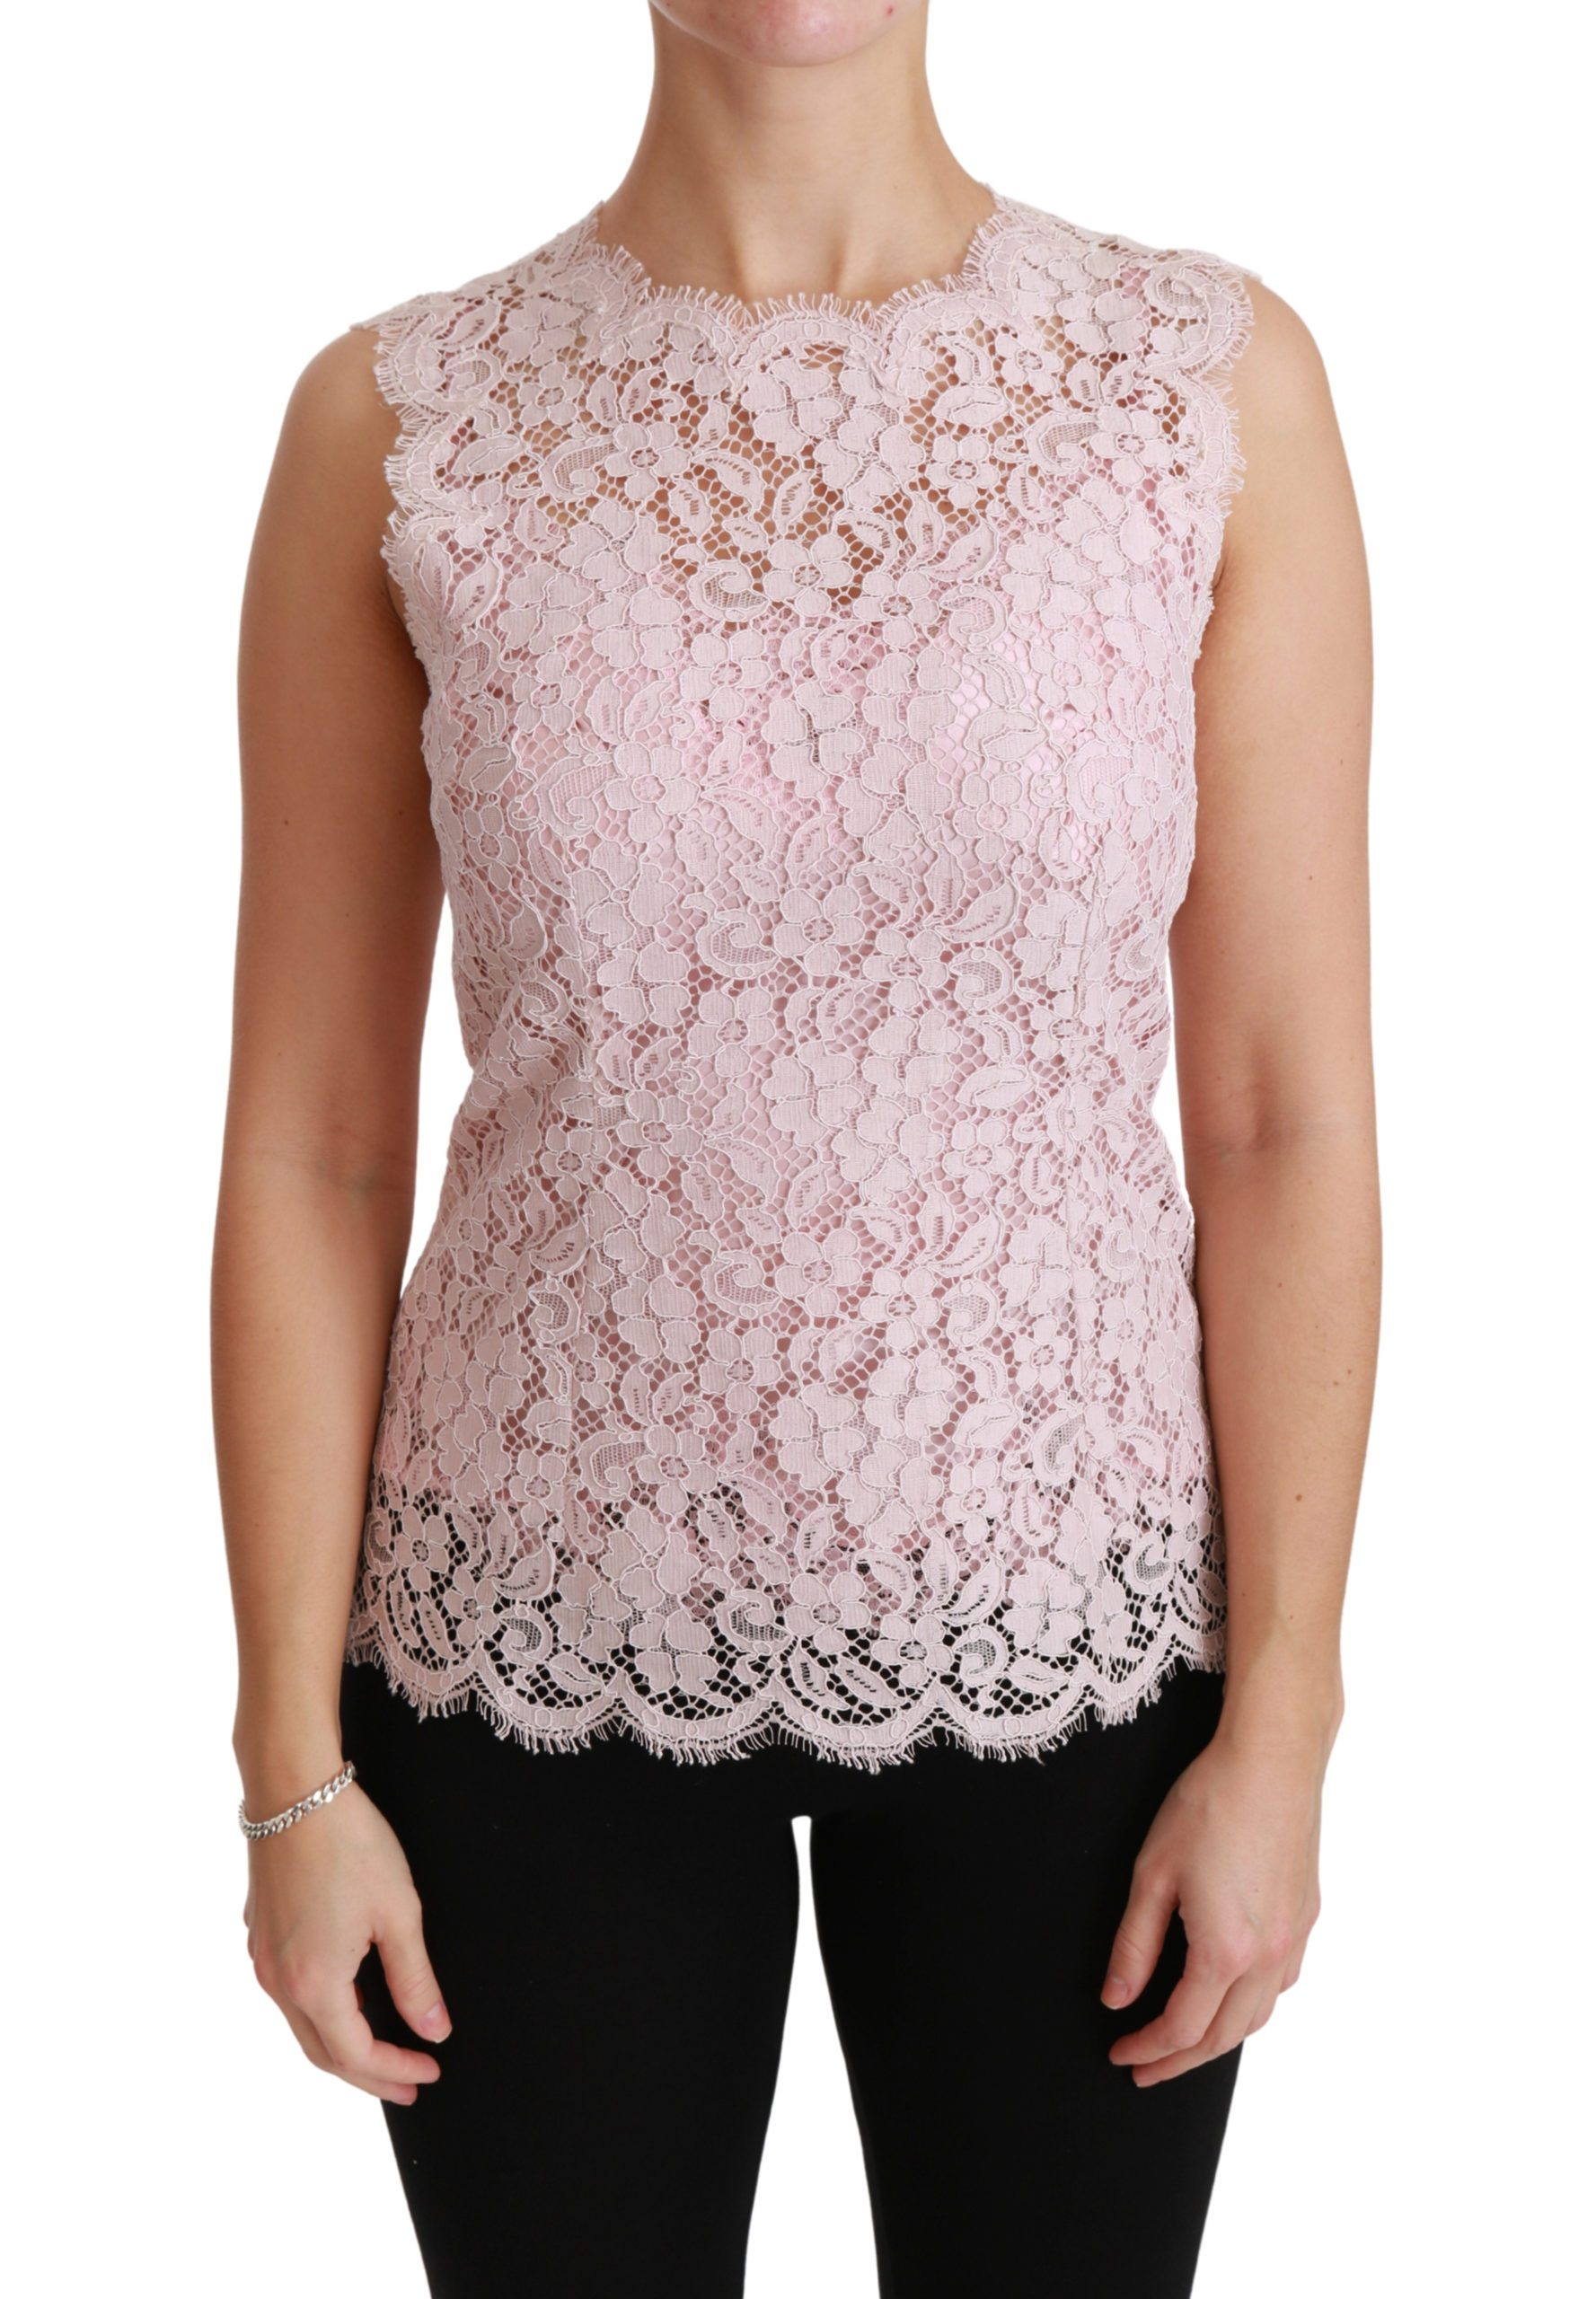 Dolce & Gabbana Women's Lace Sleeveless Cotton Top Pink TSH4398 - IT40|S